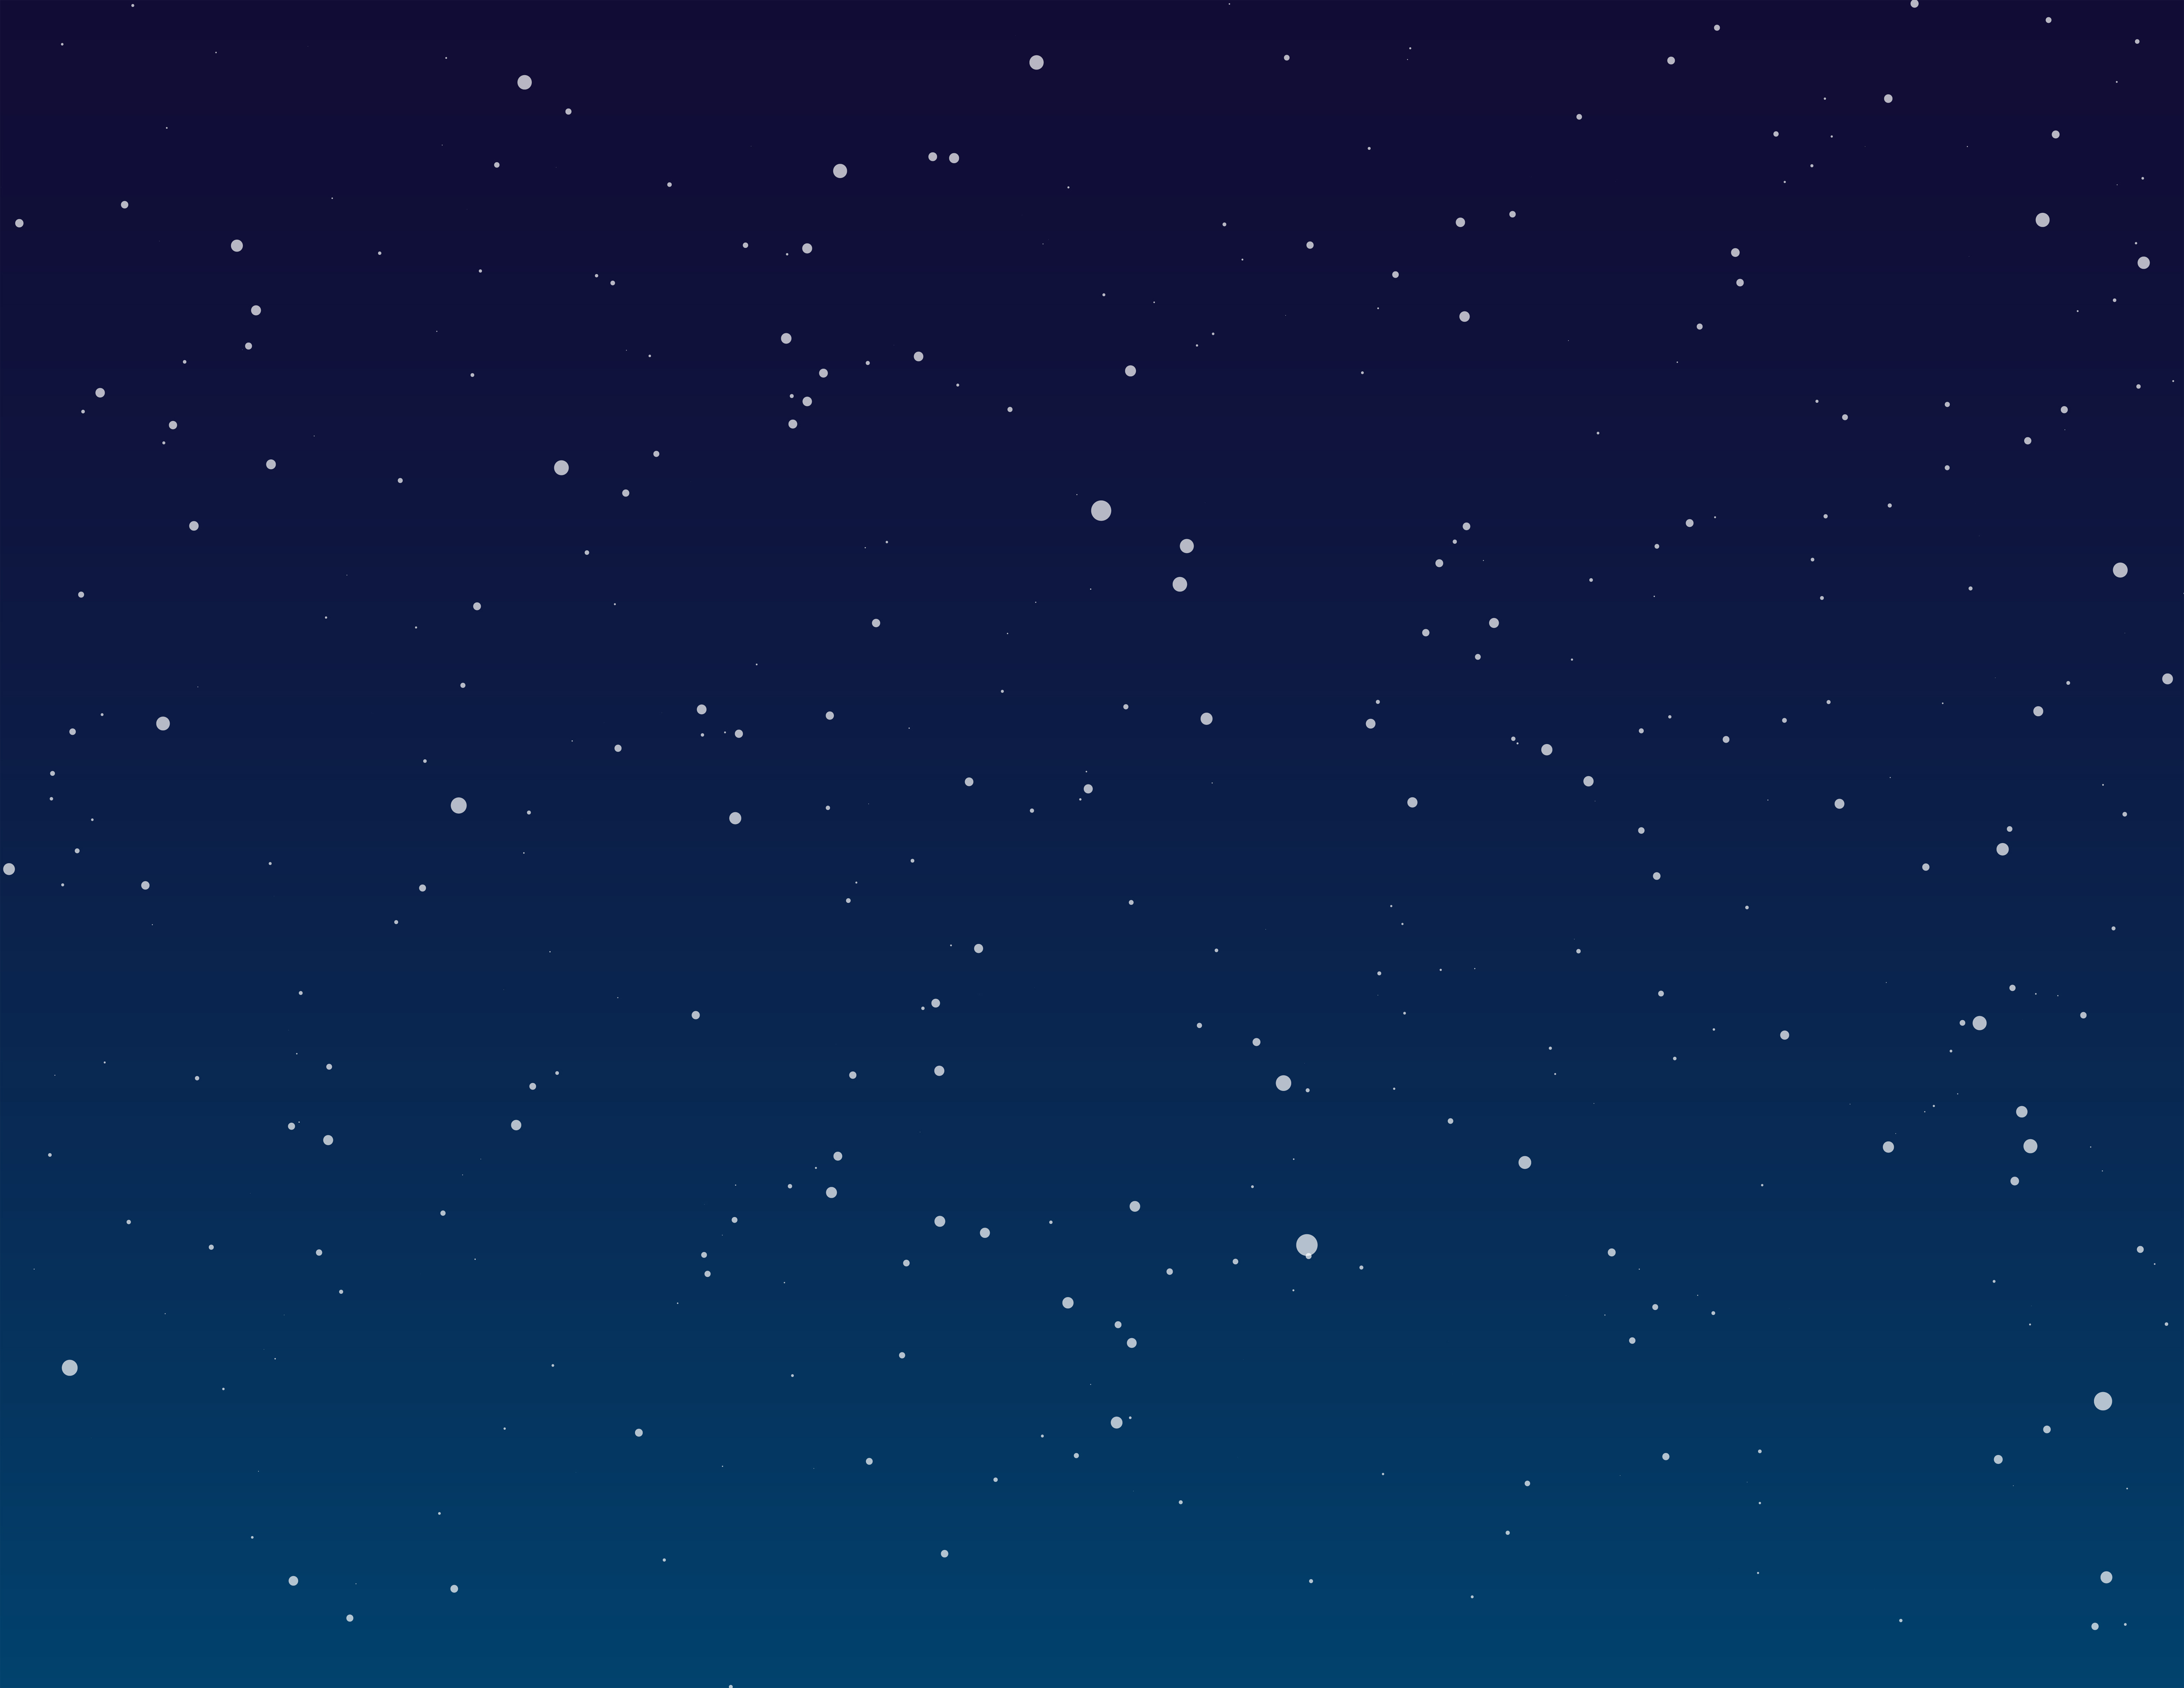 Free Night Sky Wallpaper